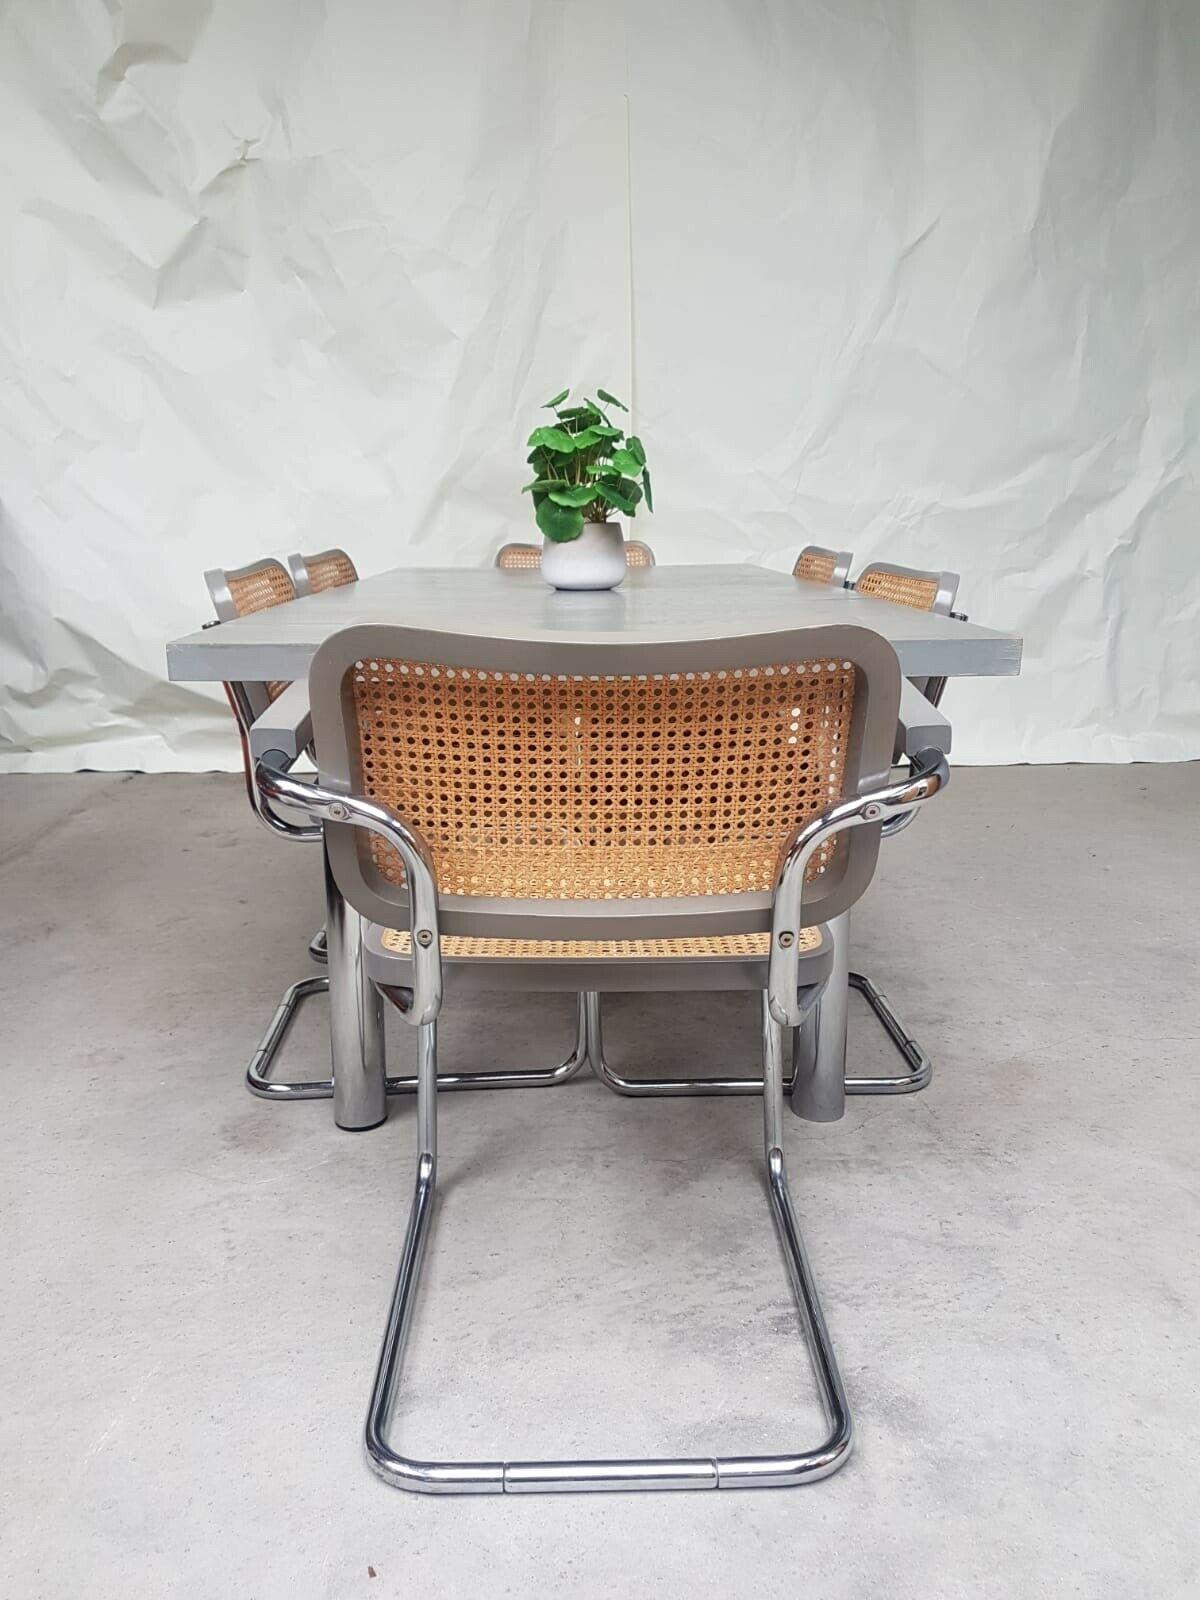 Vtg Late Mid Century Marcel Breuer Habitat Bauhaus Cesca Dining Table 6 Chairs